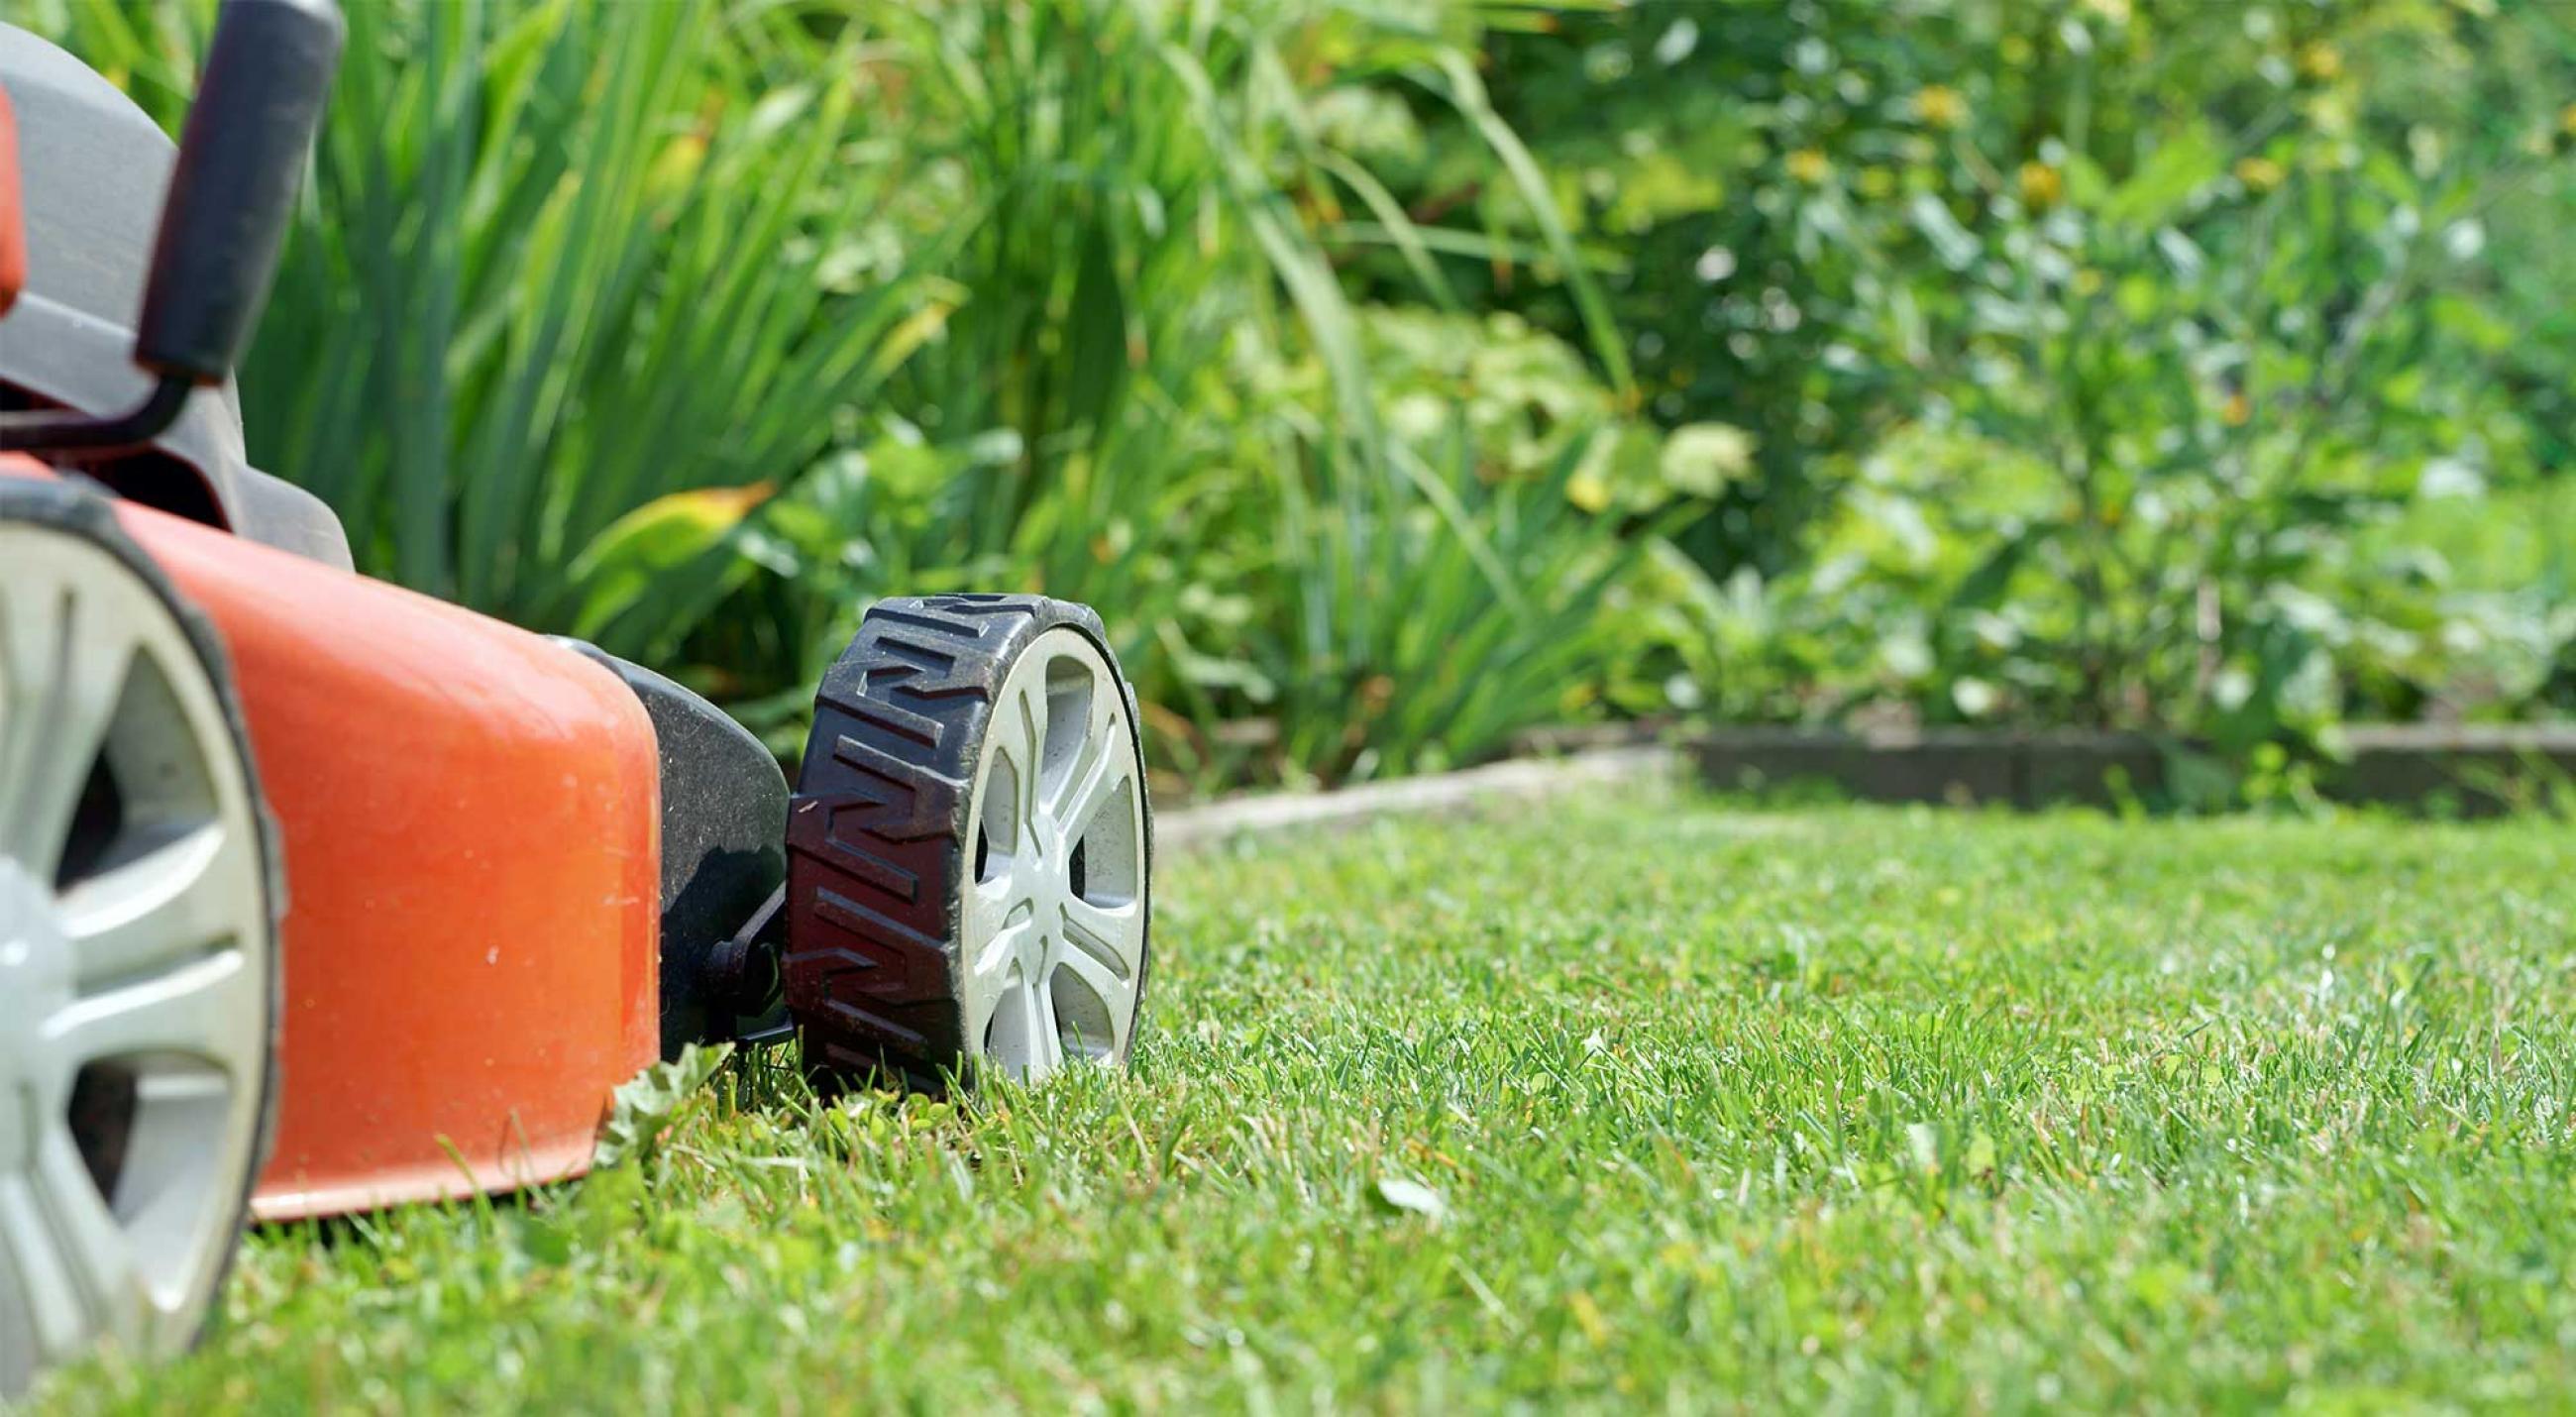 entretien jardin defiscalisation